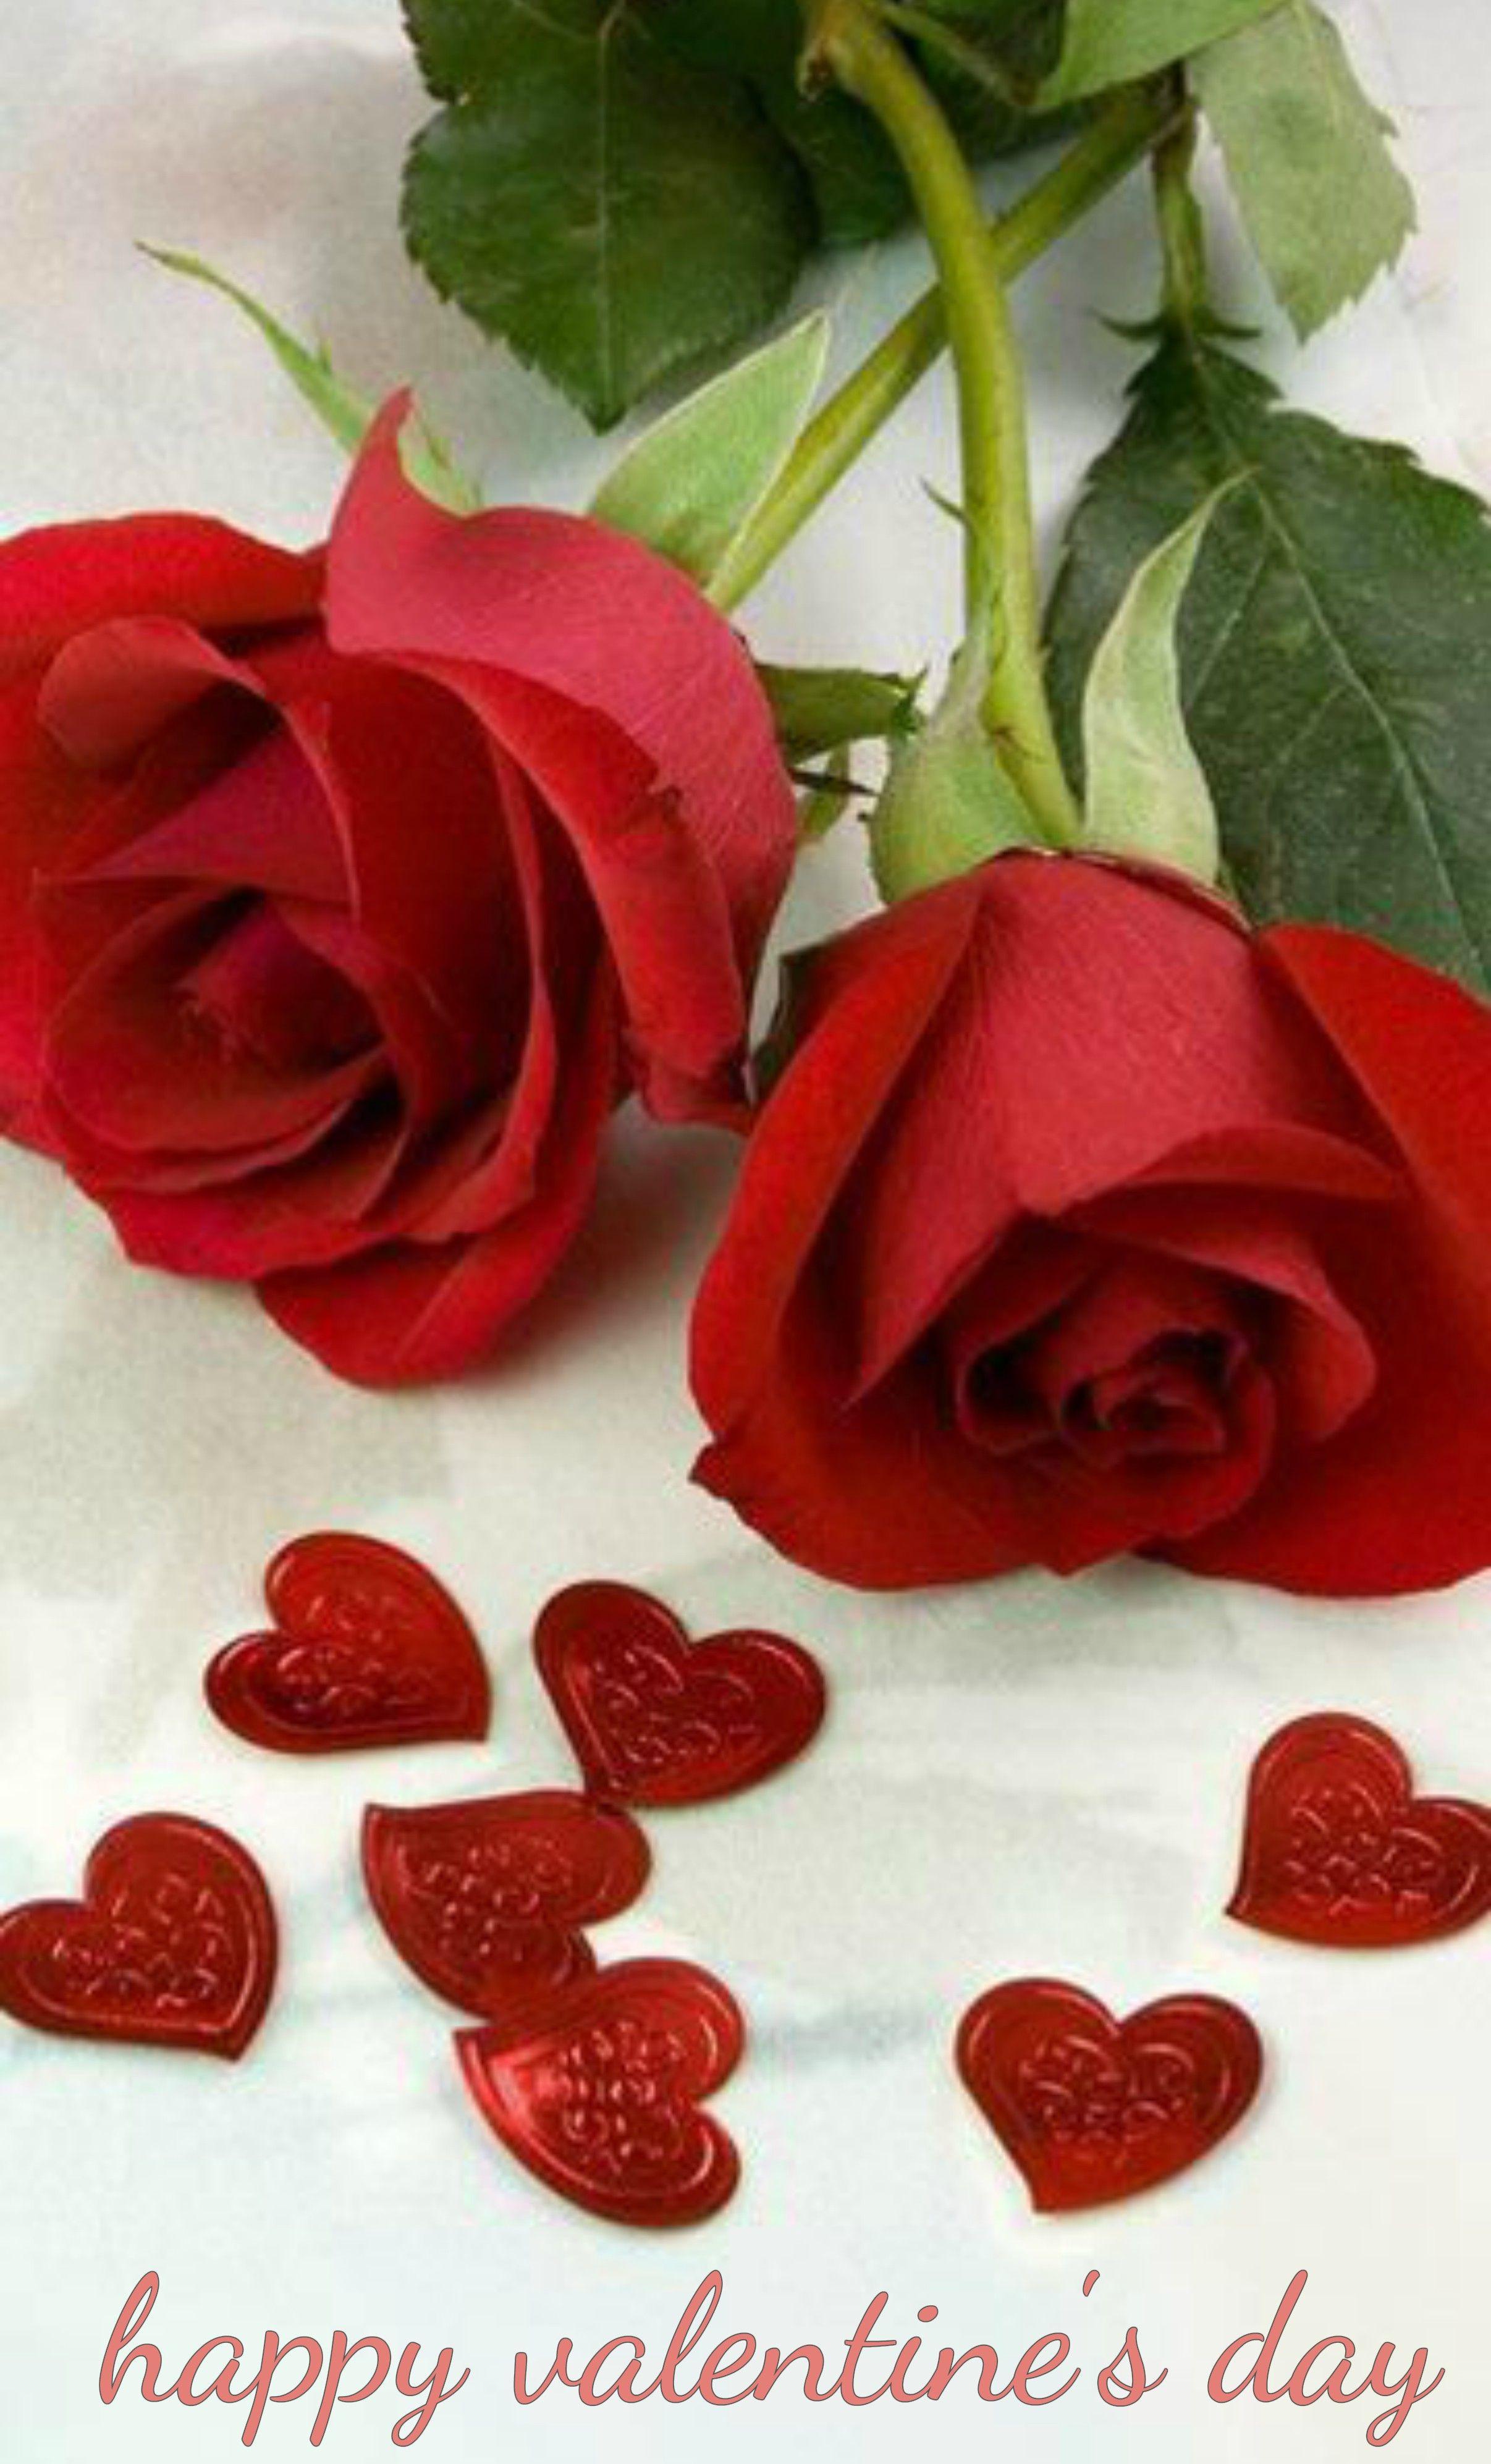 Happy valentines day happy valentines pinterest happy valentines day izmirmasajfo Images